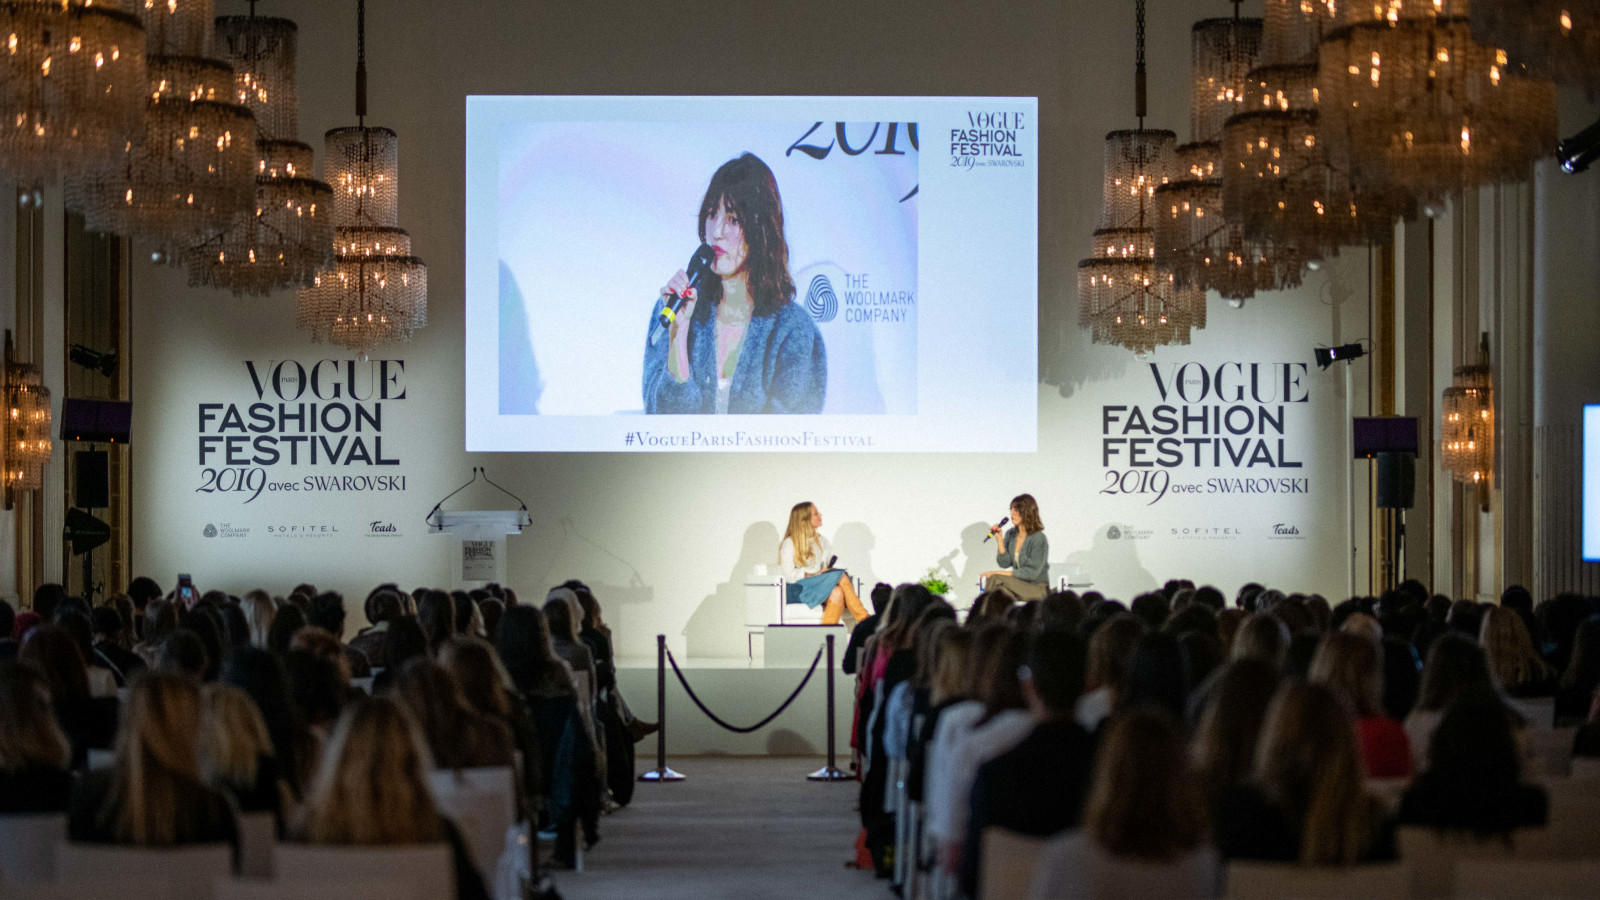 Vogue Fashion Festival 2019 DSC 3032 - Stéphanie LEFEBVRE - France - Vogue Fashion Festival - 1